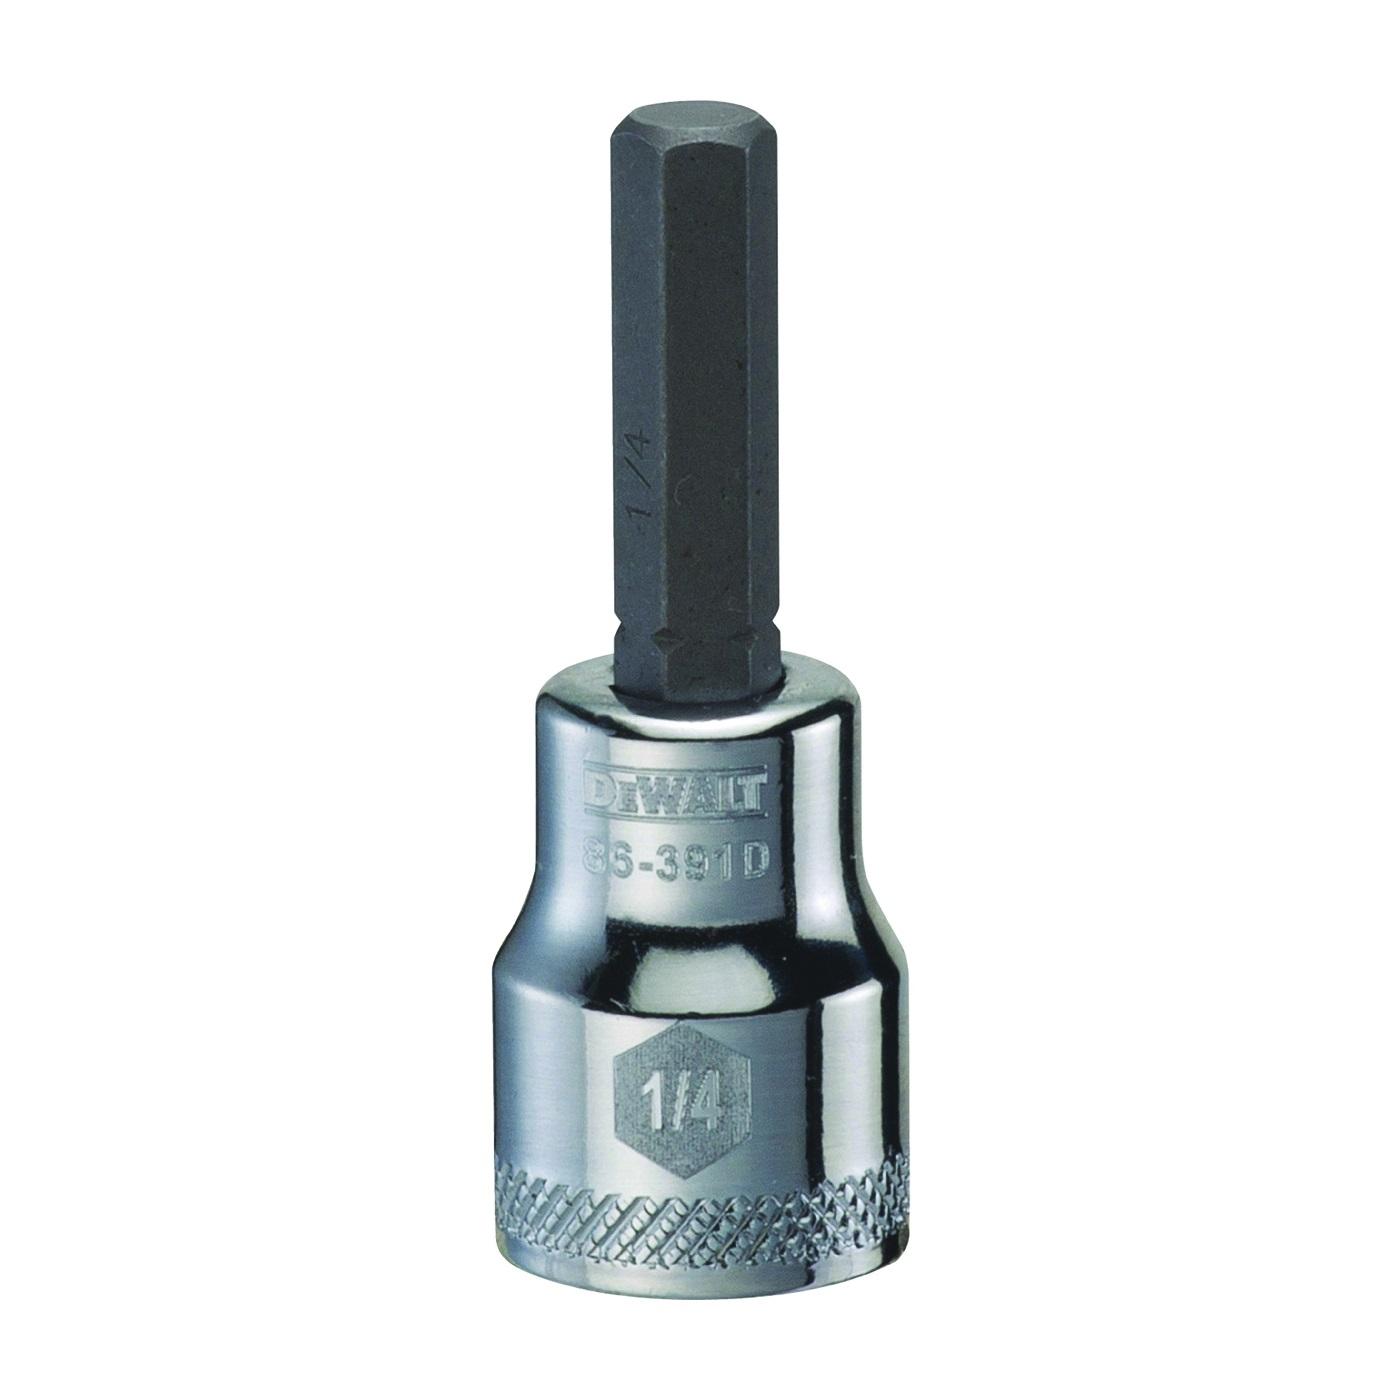 Picture of DeWALT DWMT86391OSP Fractional Hex Bit Socket, 1/4 in Tip, 3/8 in Drive, Polished Chrome Vanadium, 1-31/32 in OAL